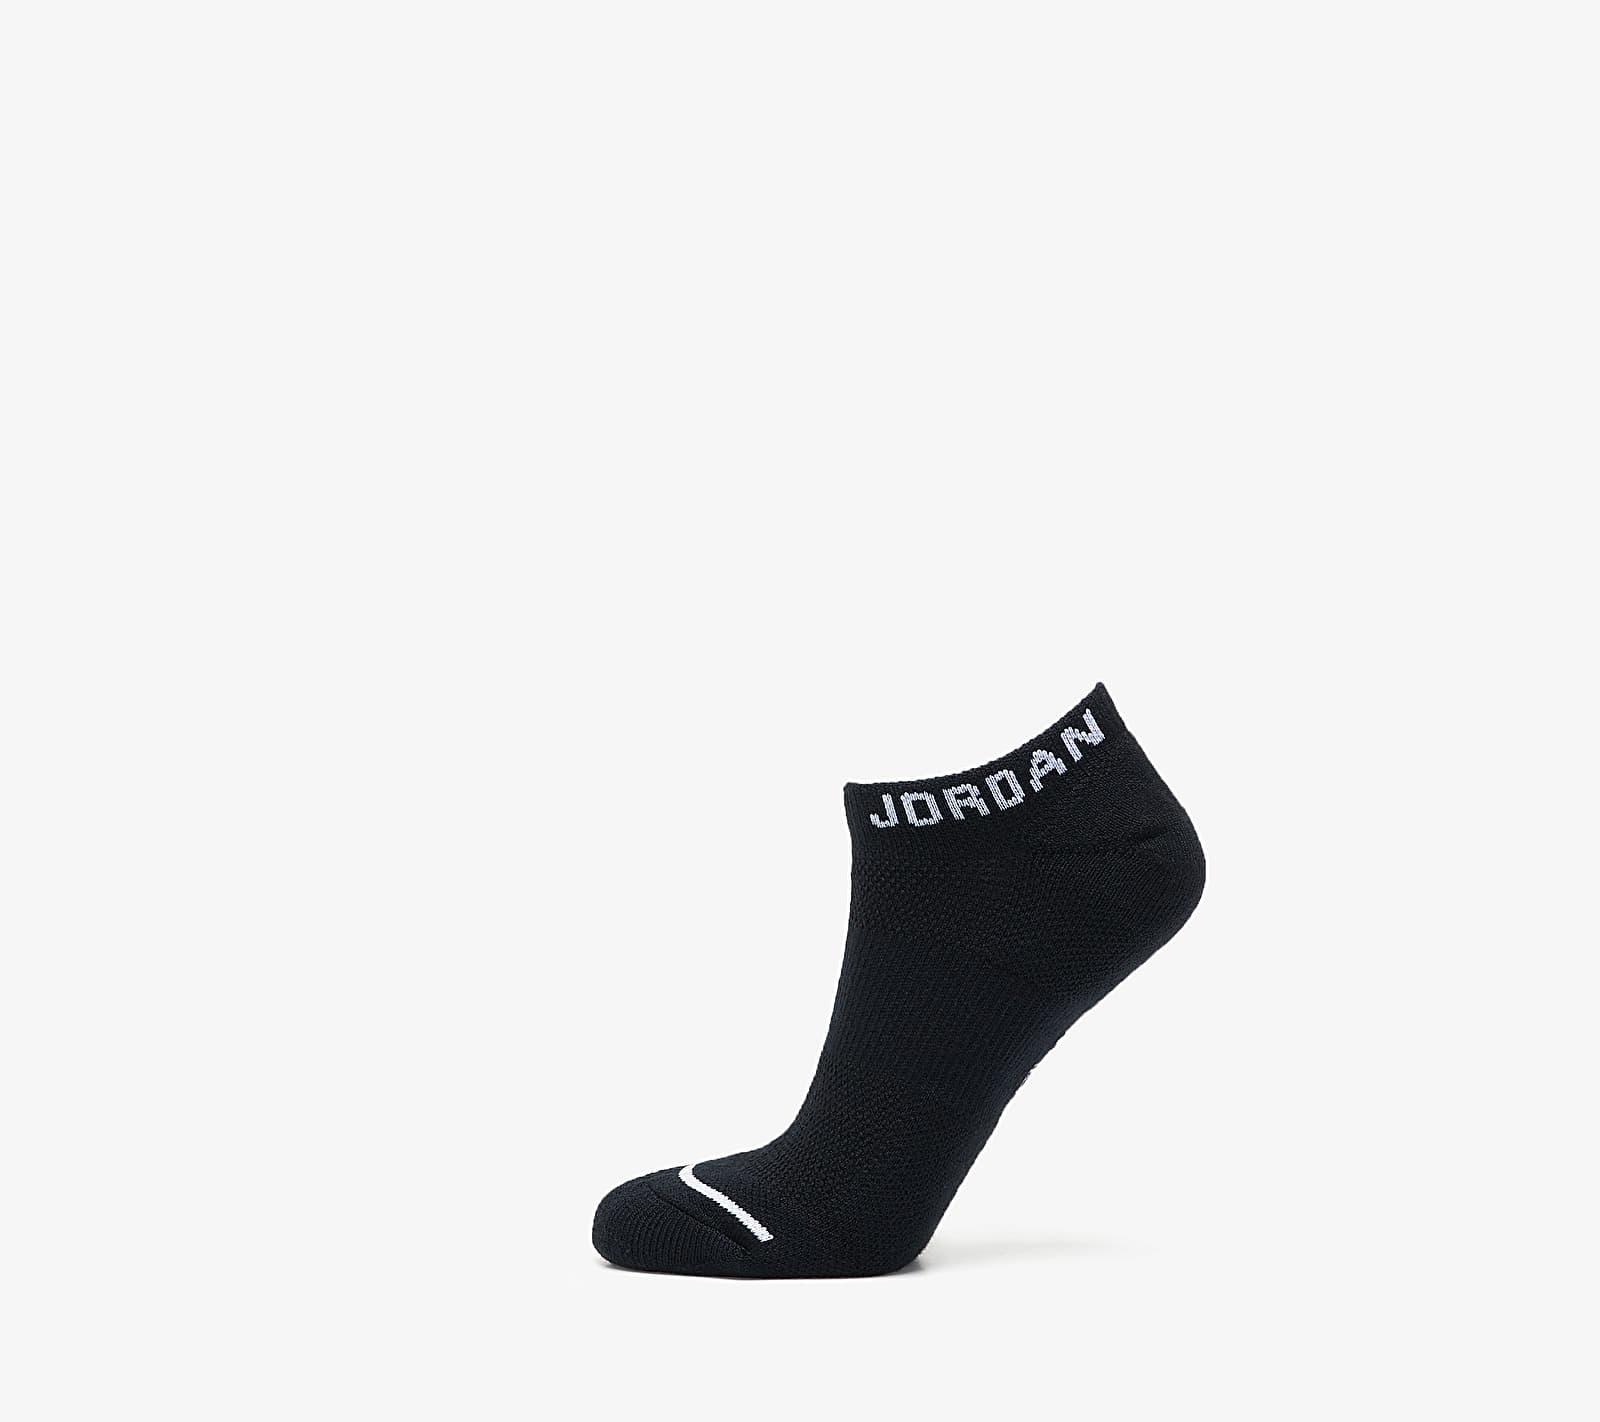 Jordan Everyday Max No Show 3 Pair Socks Black/ Black/ Black